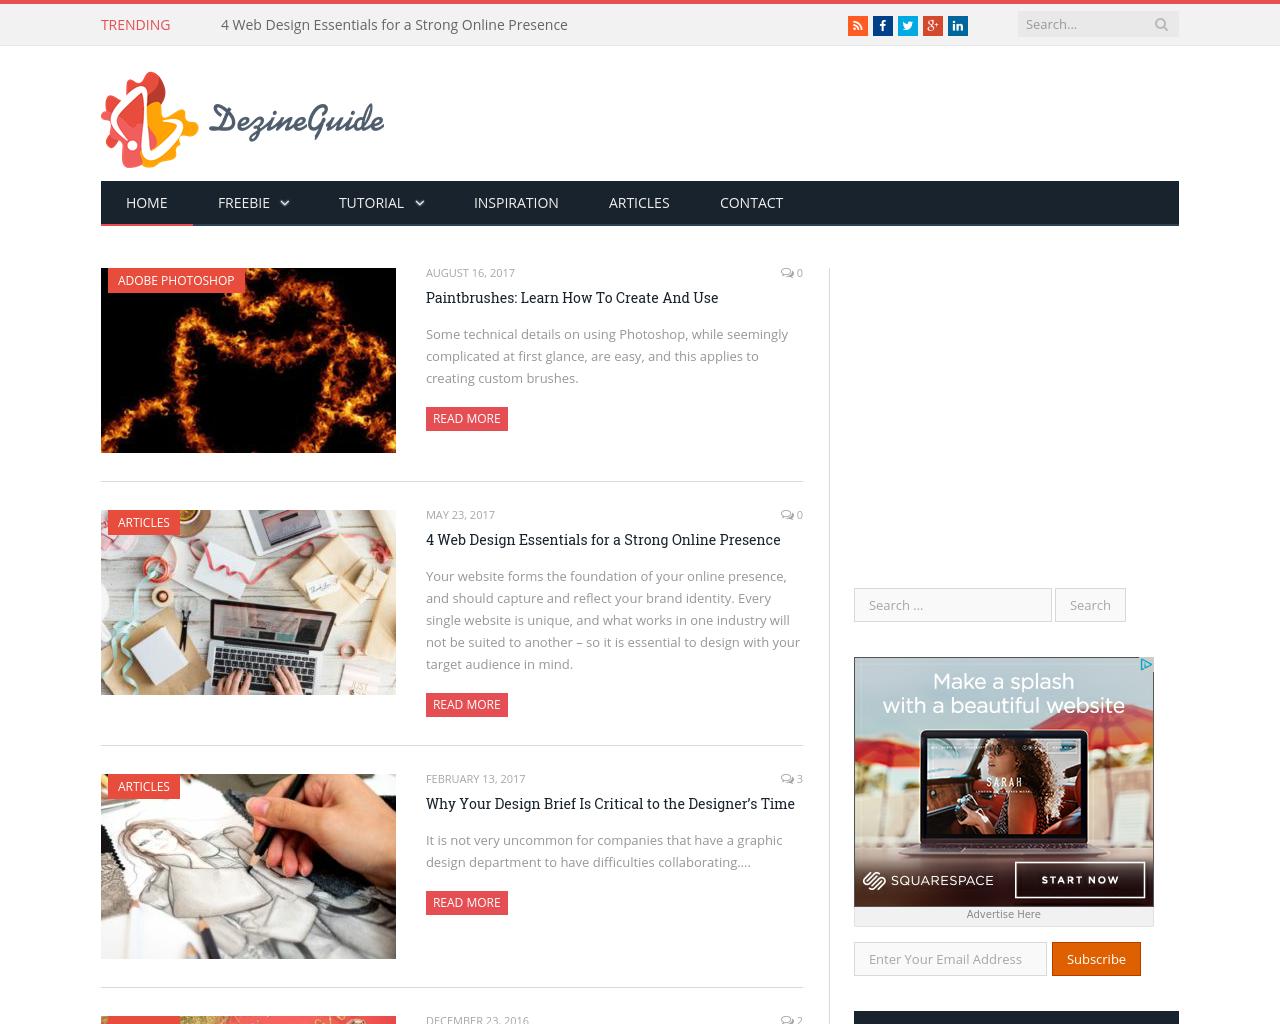 DezineGuide-Advertising-Reviews-Pricing